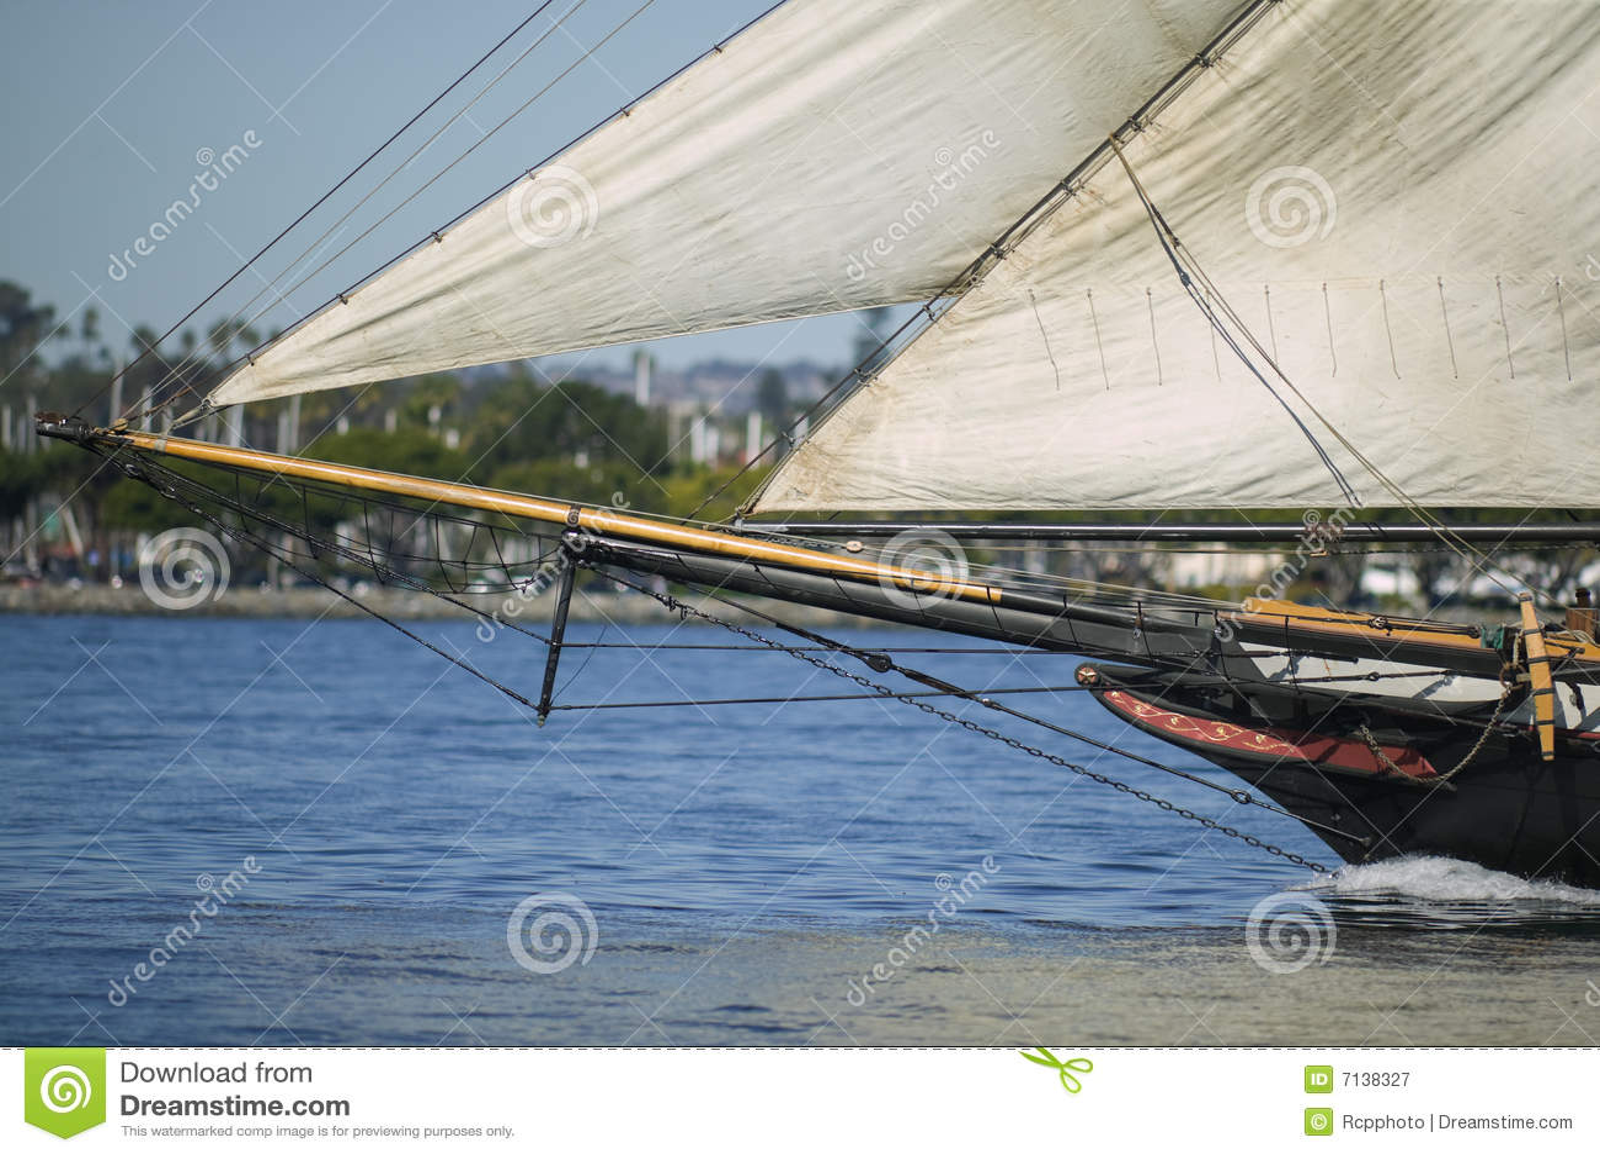 Arqueamiento de un velero